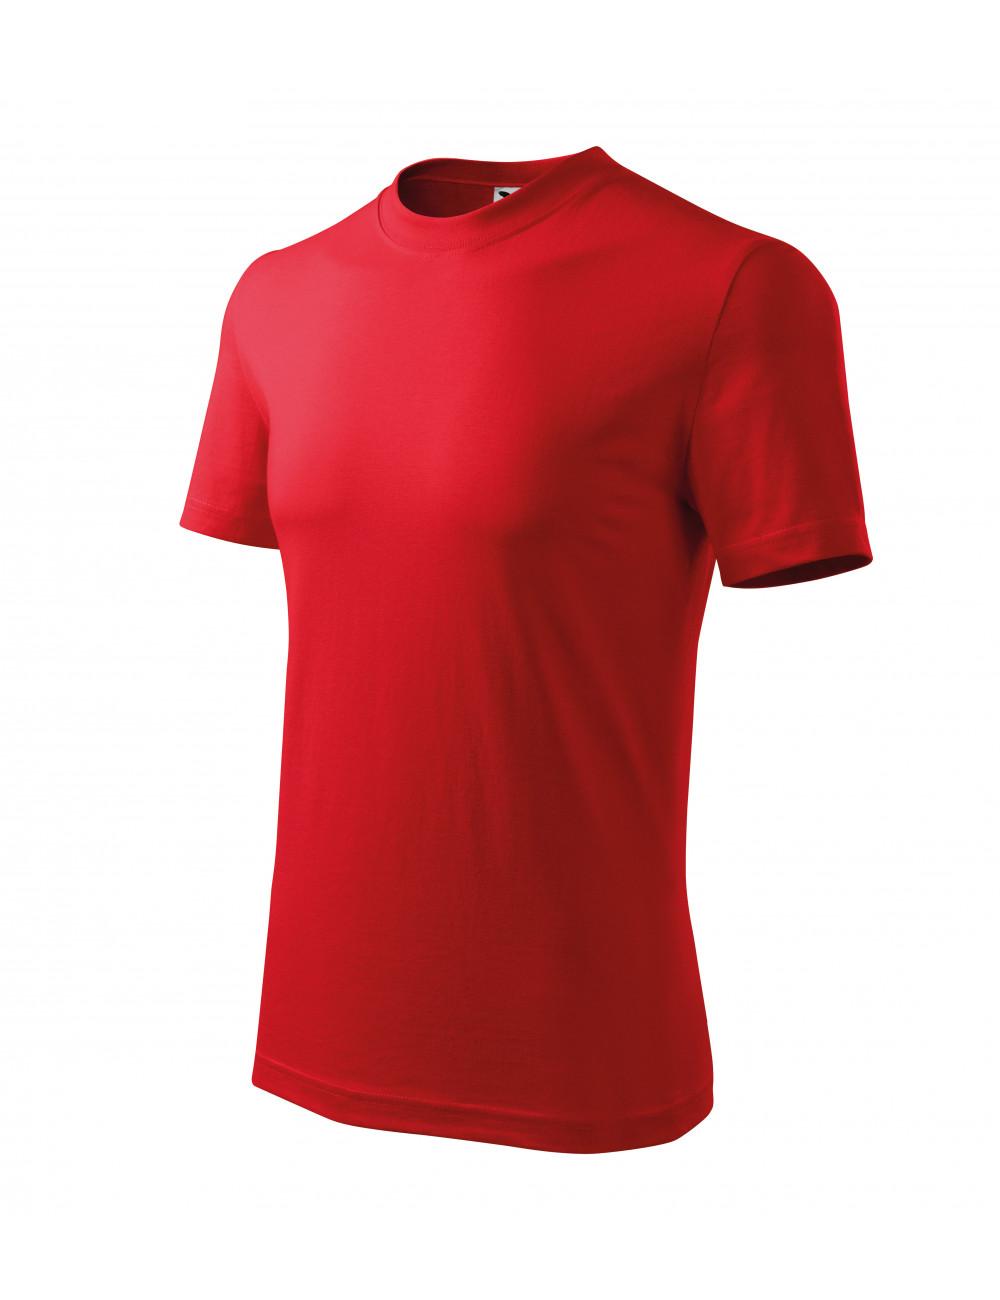 Adler MALFINI Koszulka unisex Classic 101 czerwony